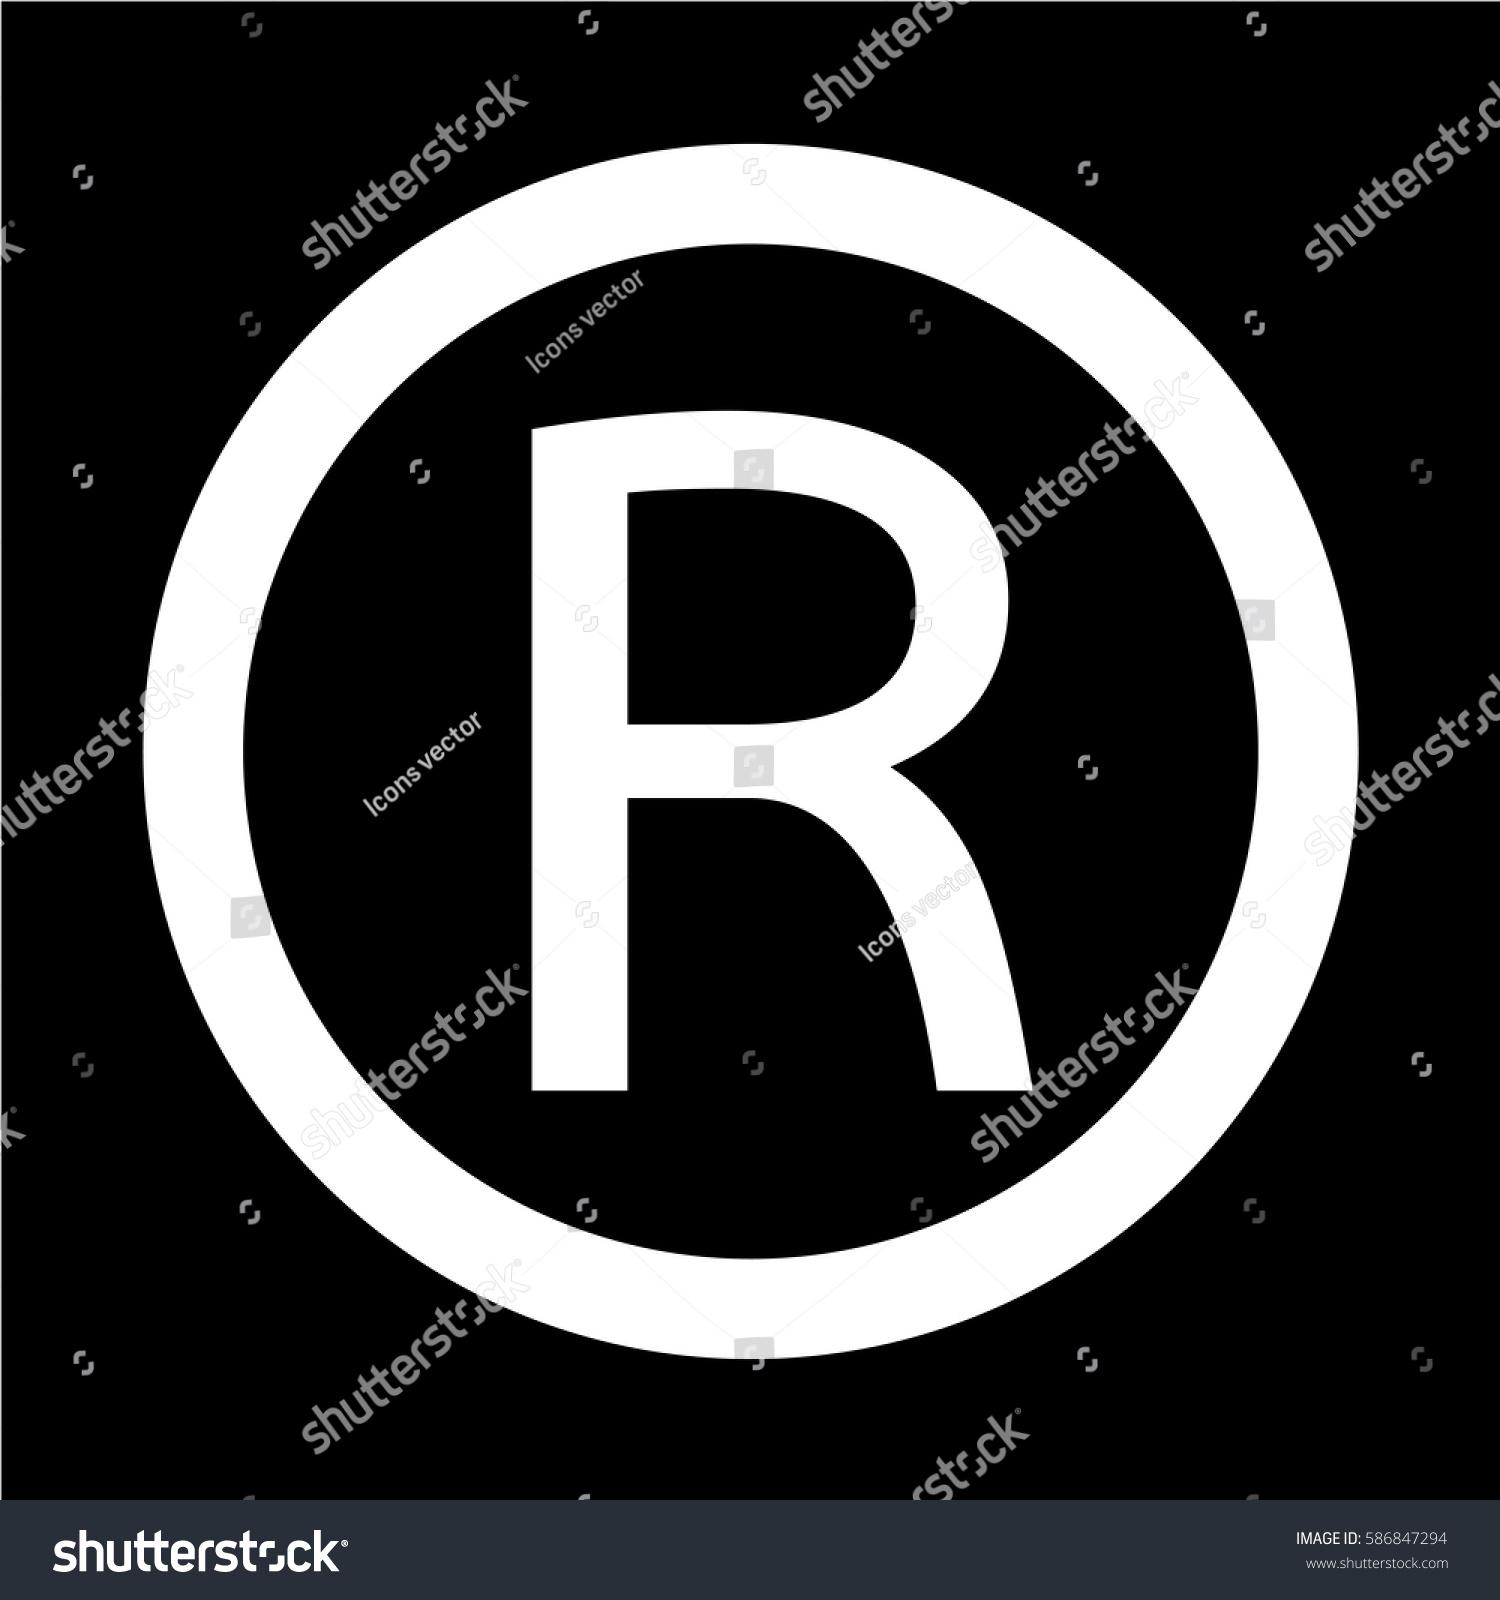 Registered Trademark Icon Ez Canvas